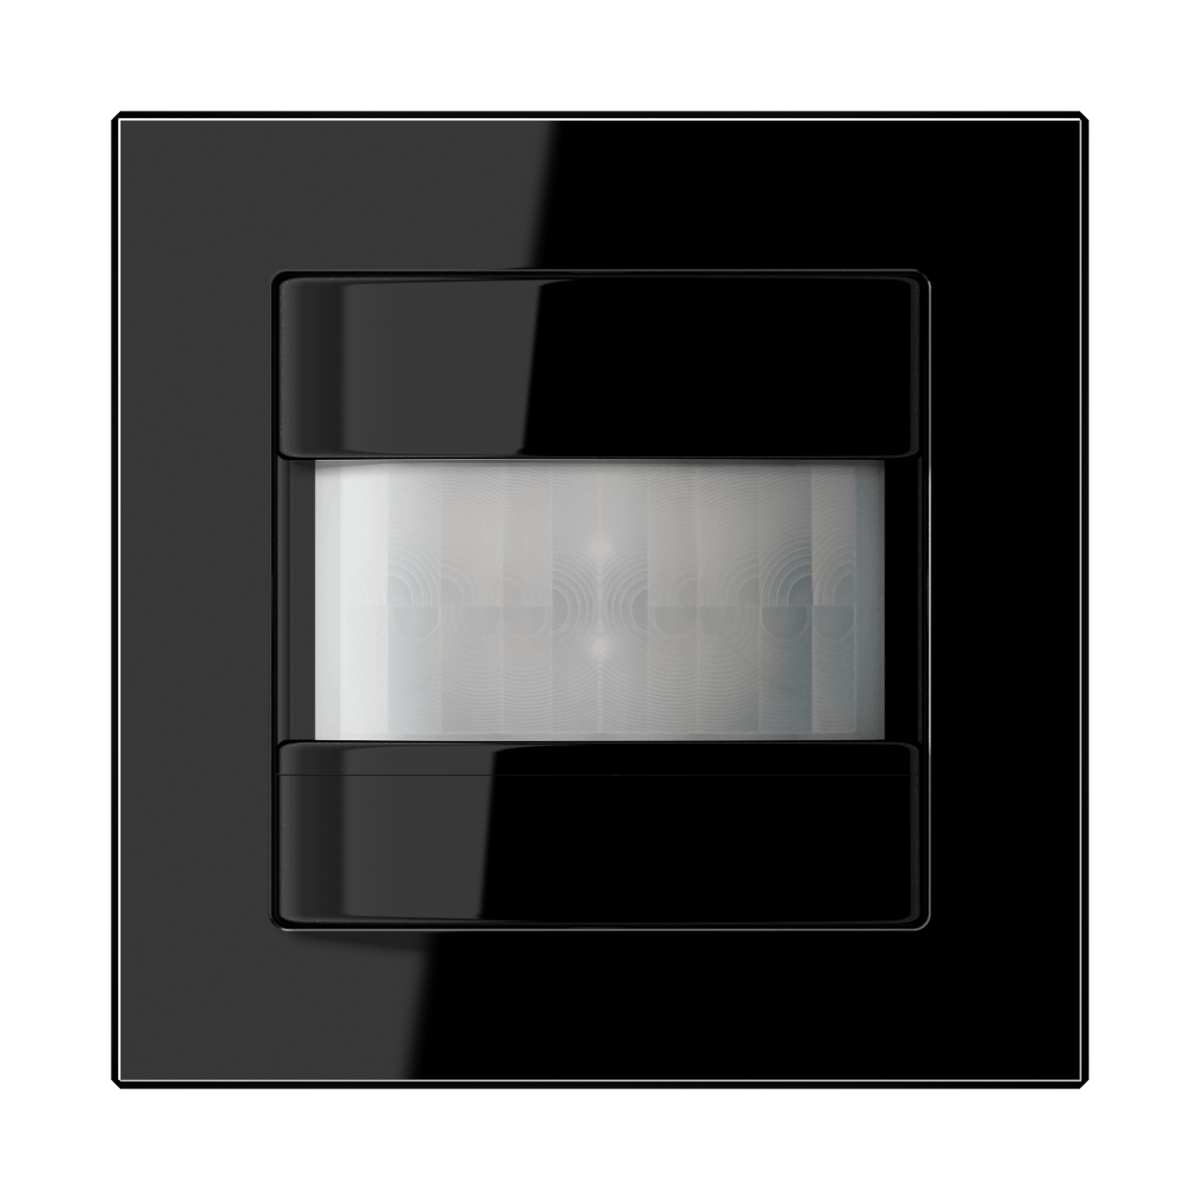 Variasi A Creation Black  LightingInterior LightingCeiling Lamps 4